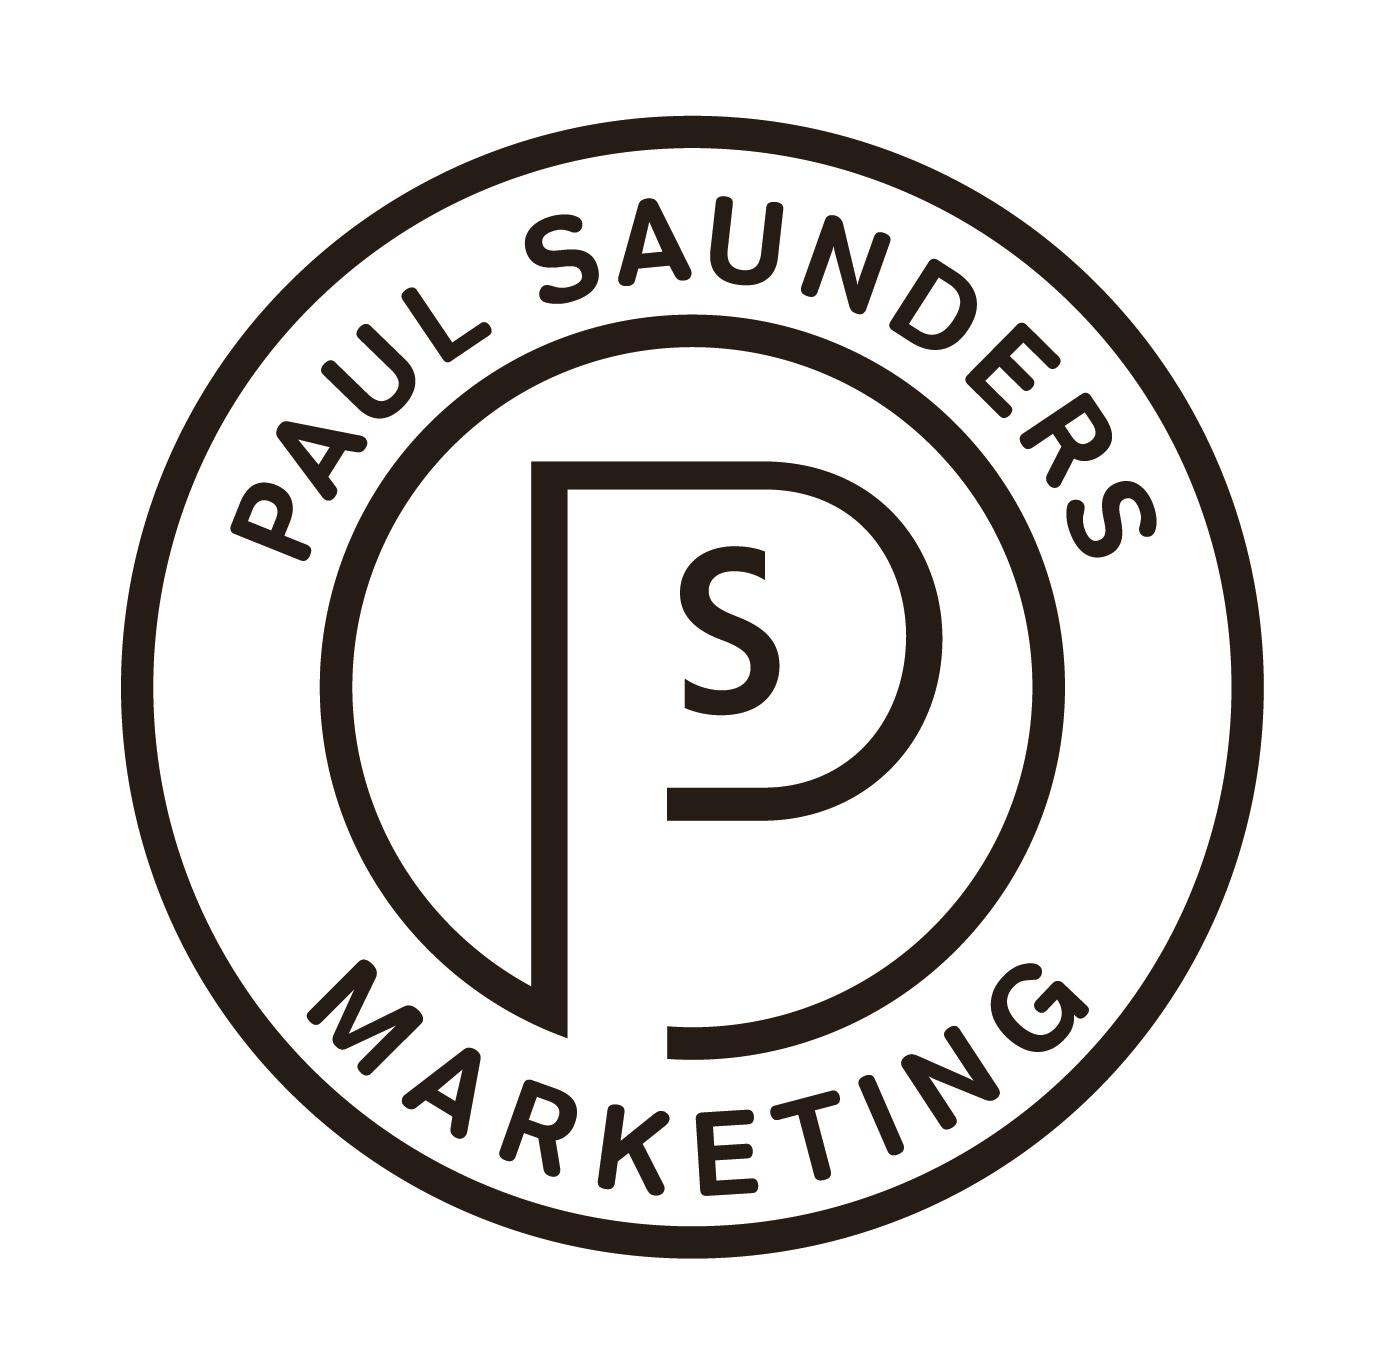 Paul Saunders Marketing